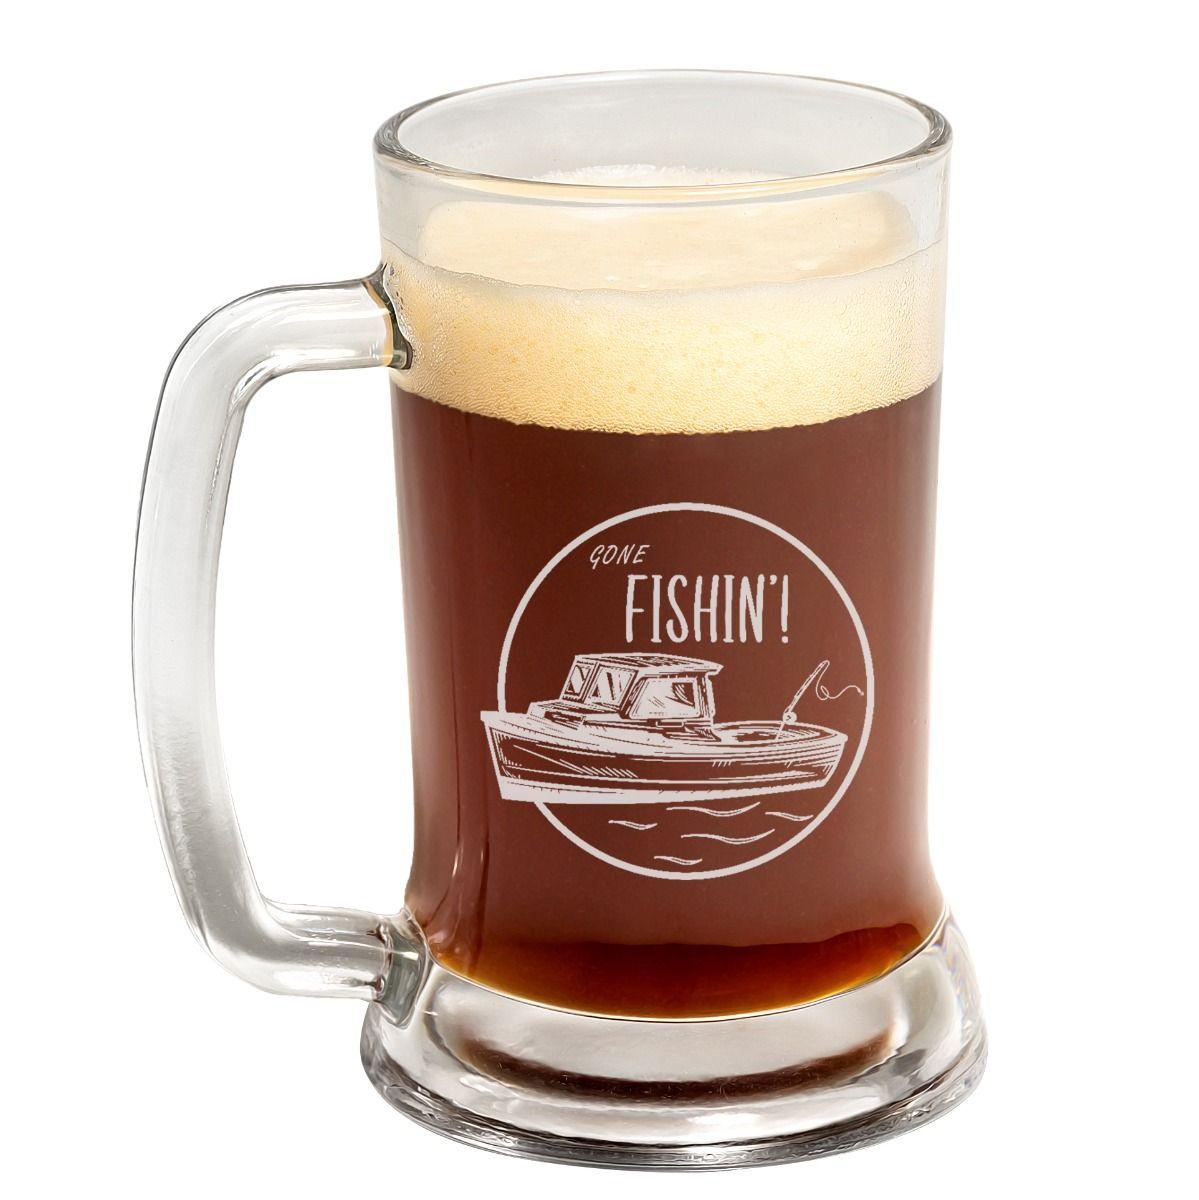 Boat Fishin' Father's Day Beer Mug